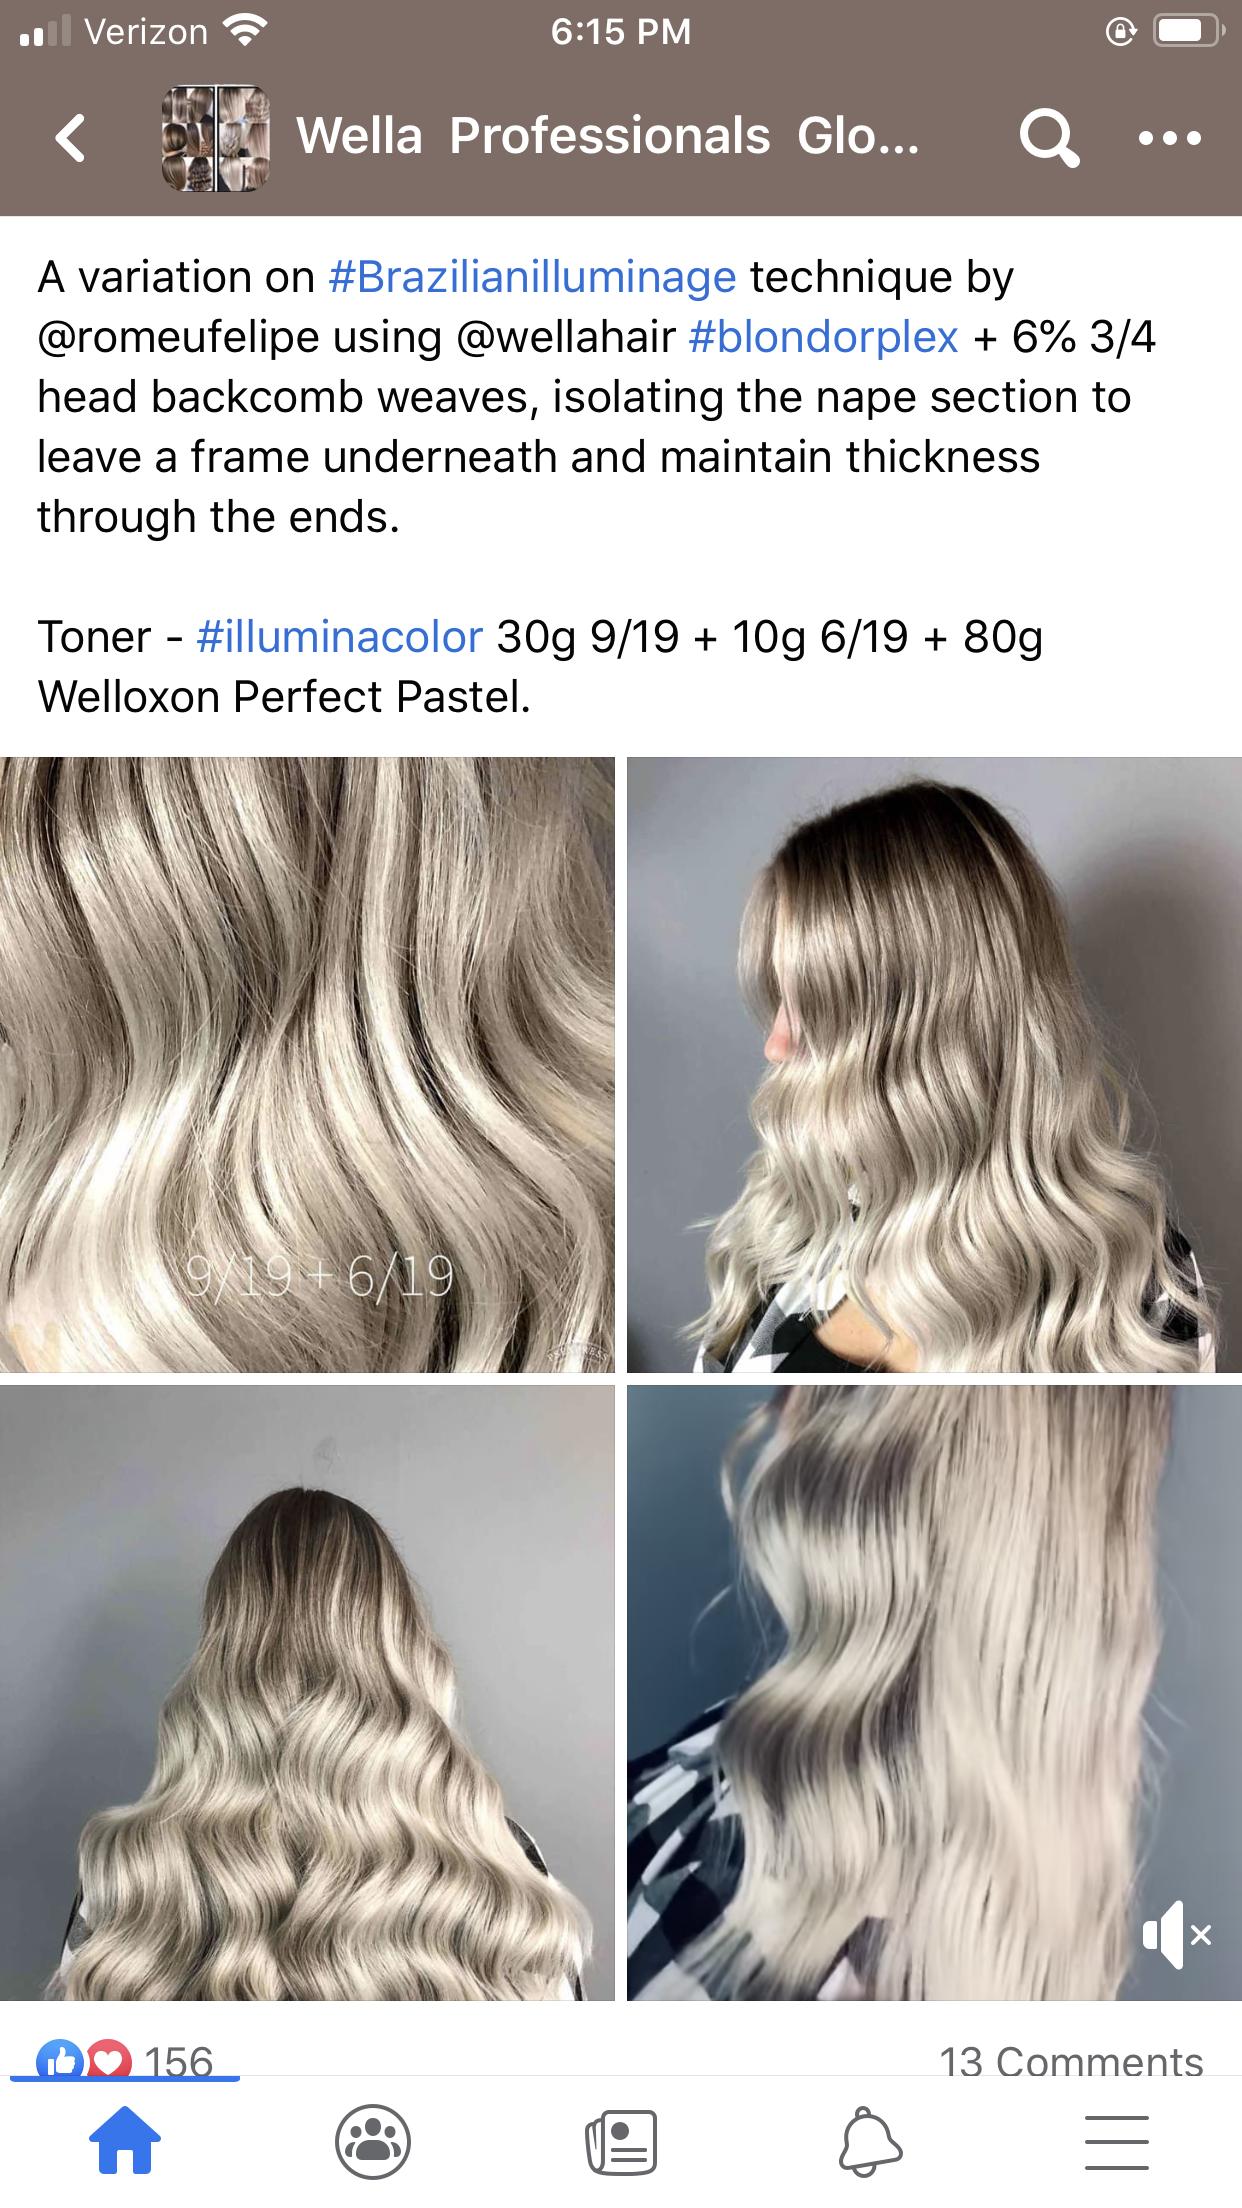 Pin By Lesha Lesha On Wella Wella Hair Color Hair Color Formulas Wella Hair